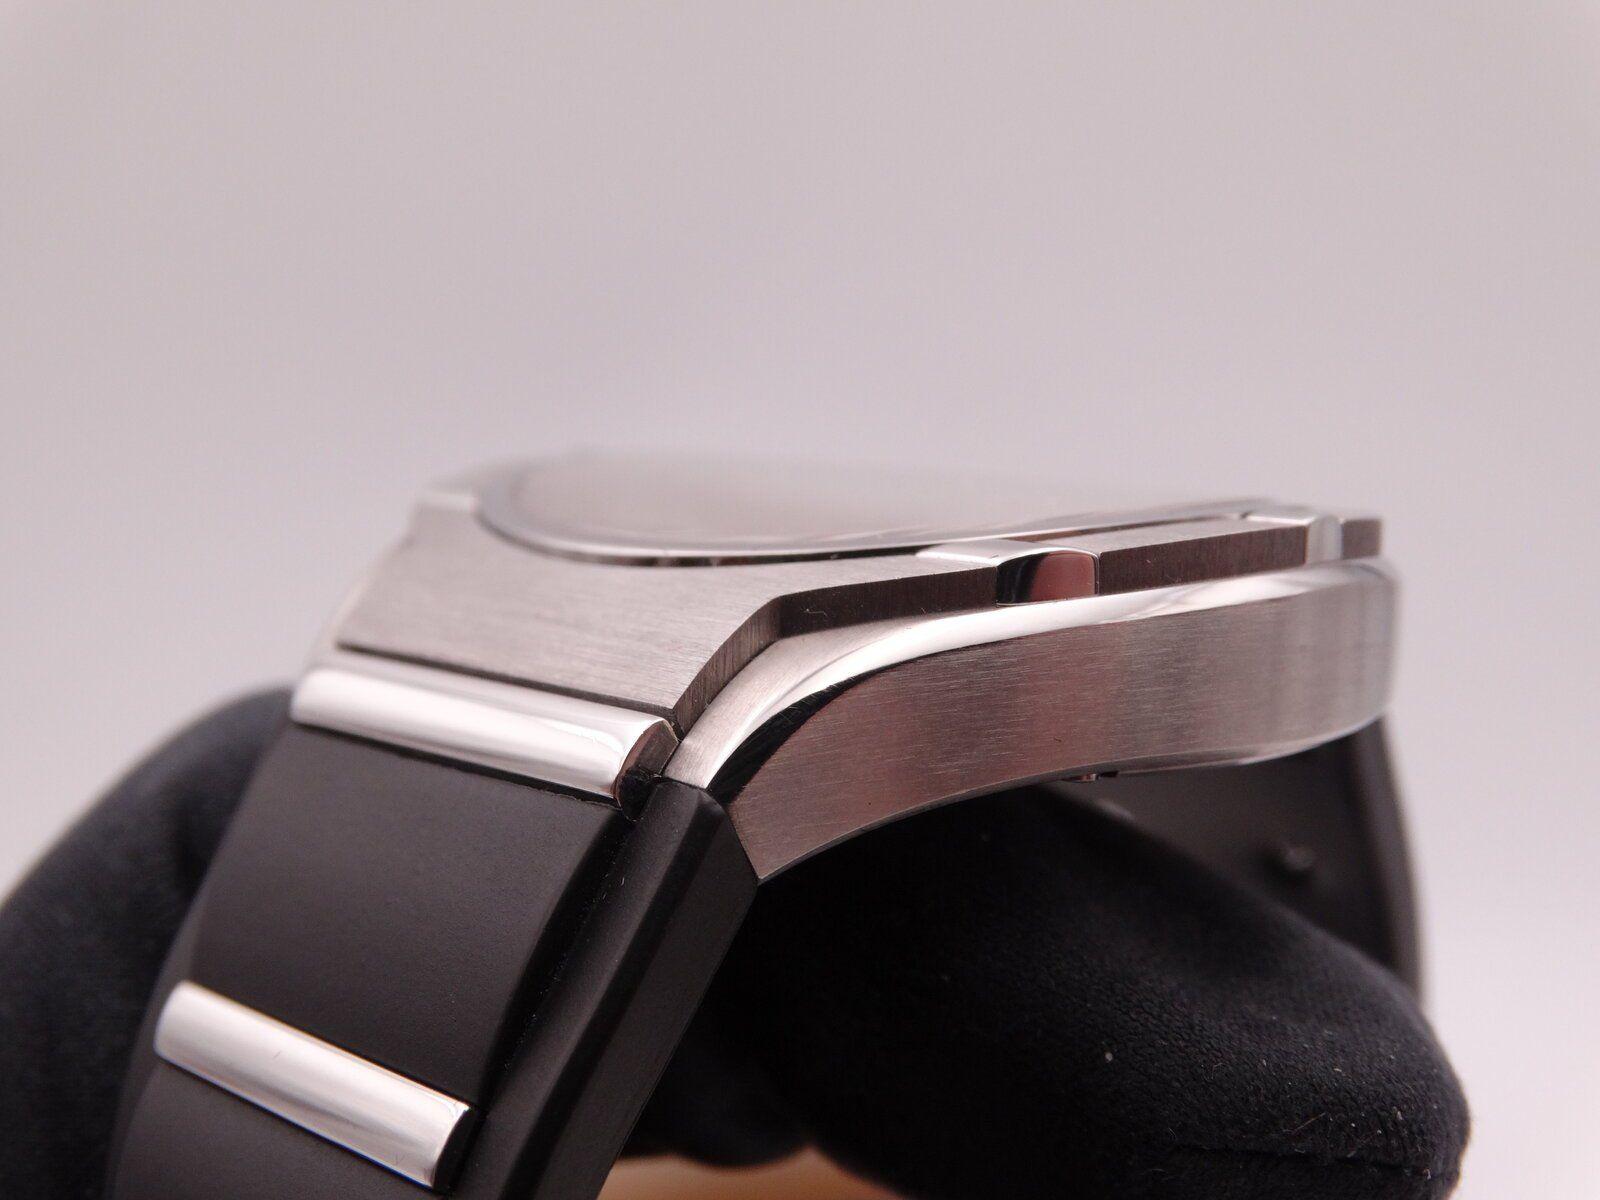 Piaget Polo FortyFive Titanium 01240.JPG